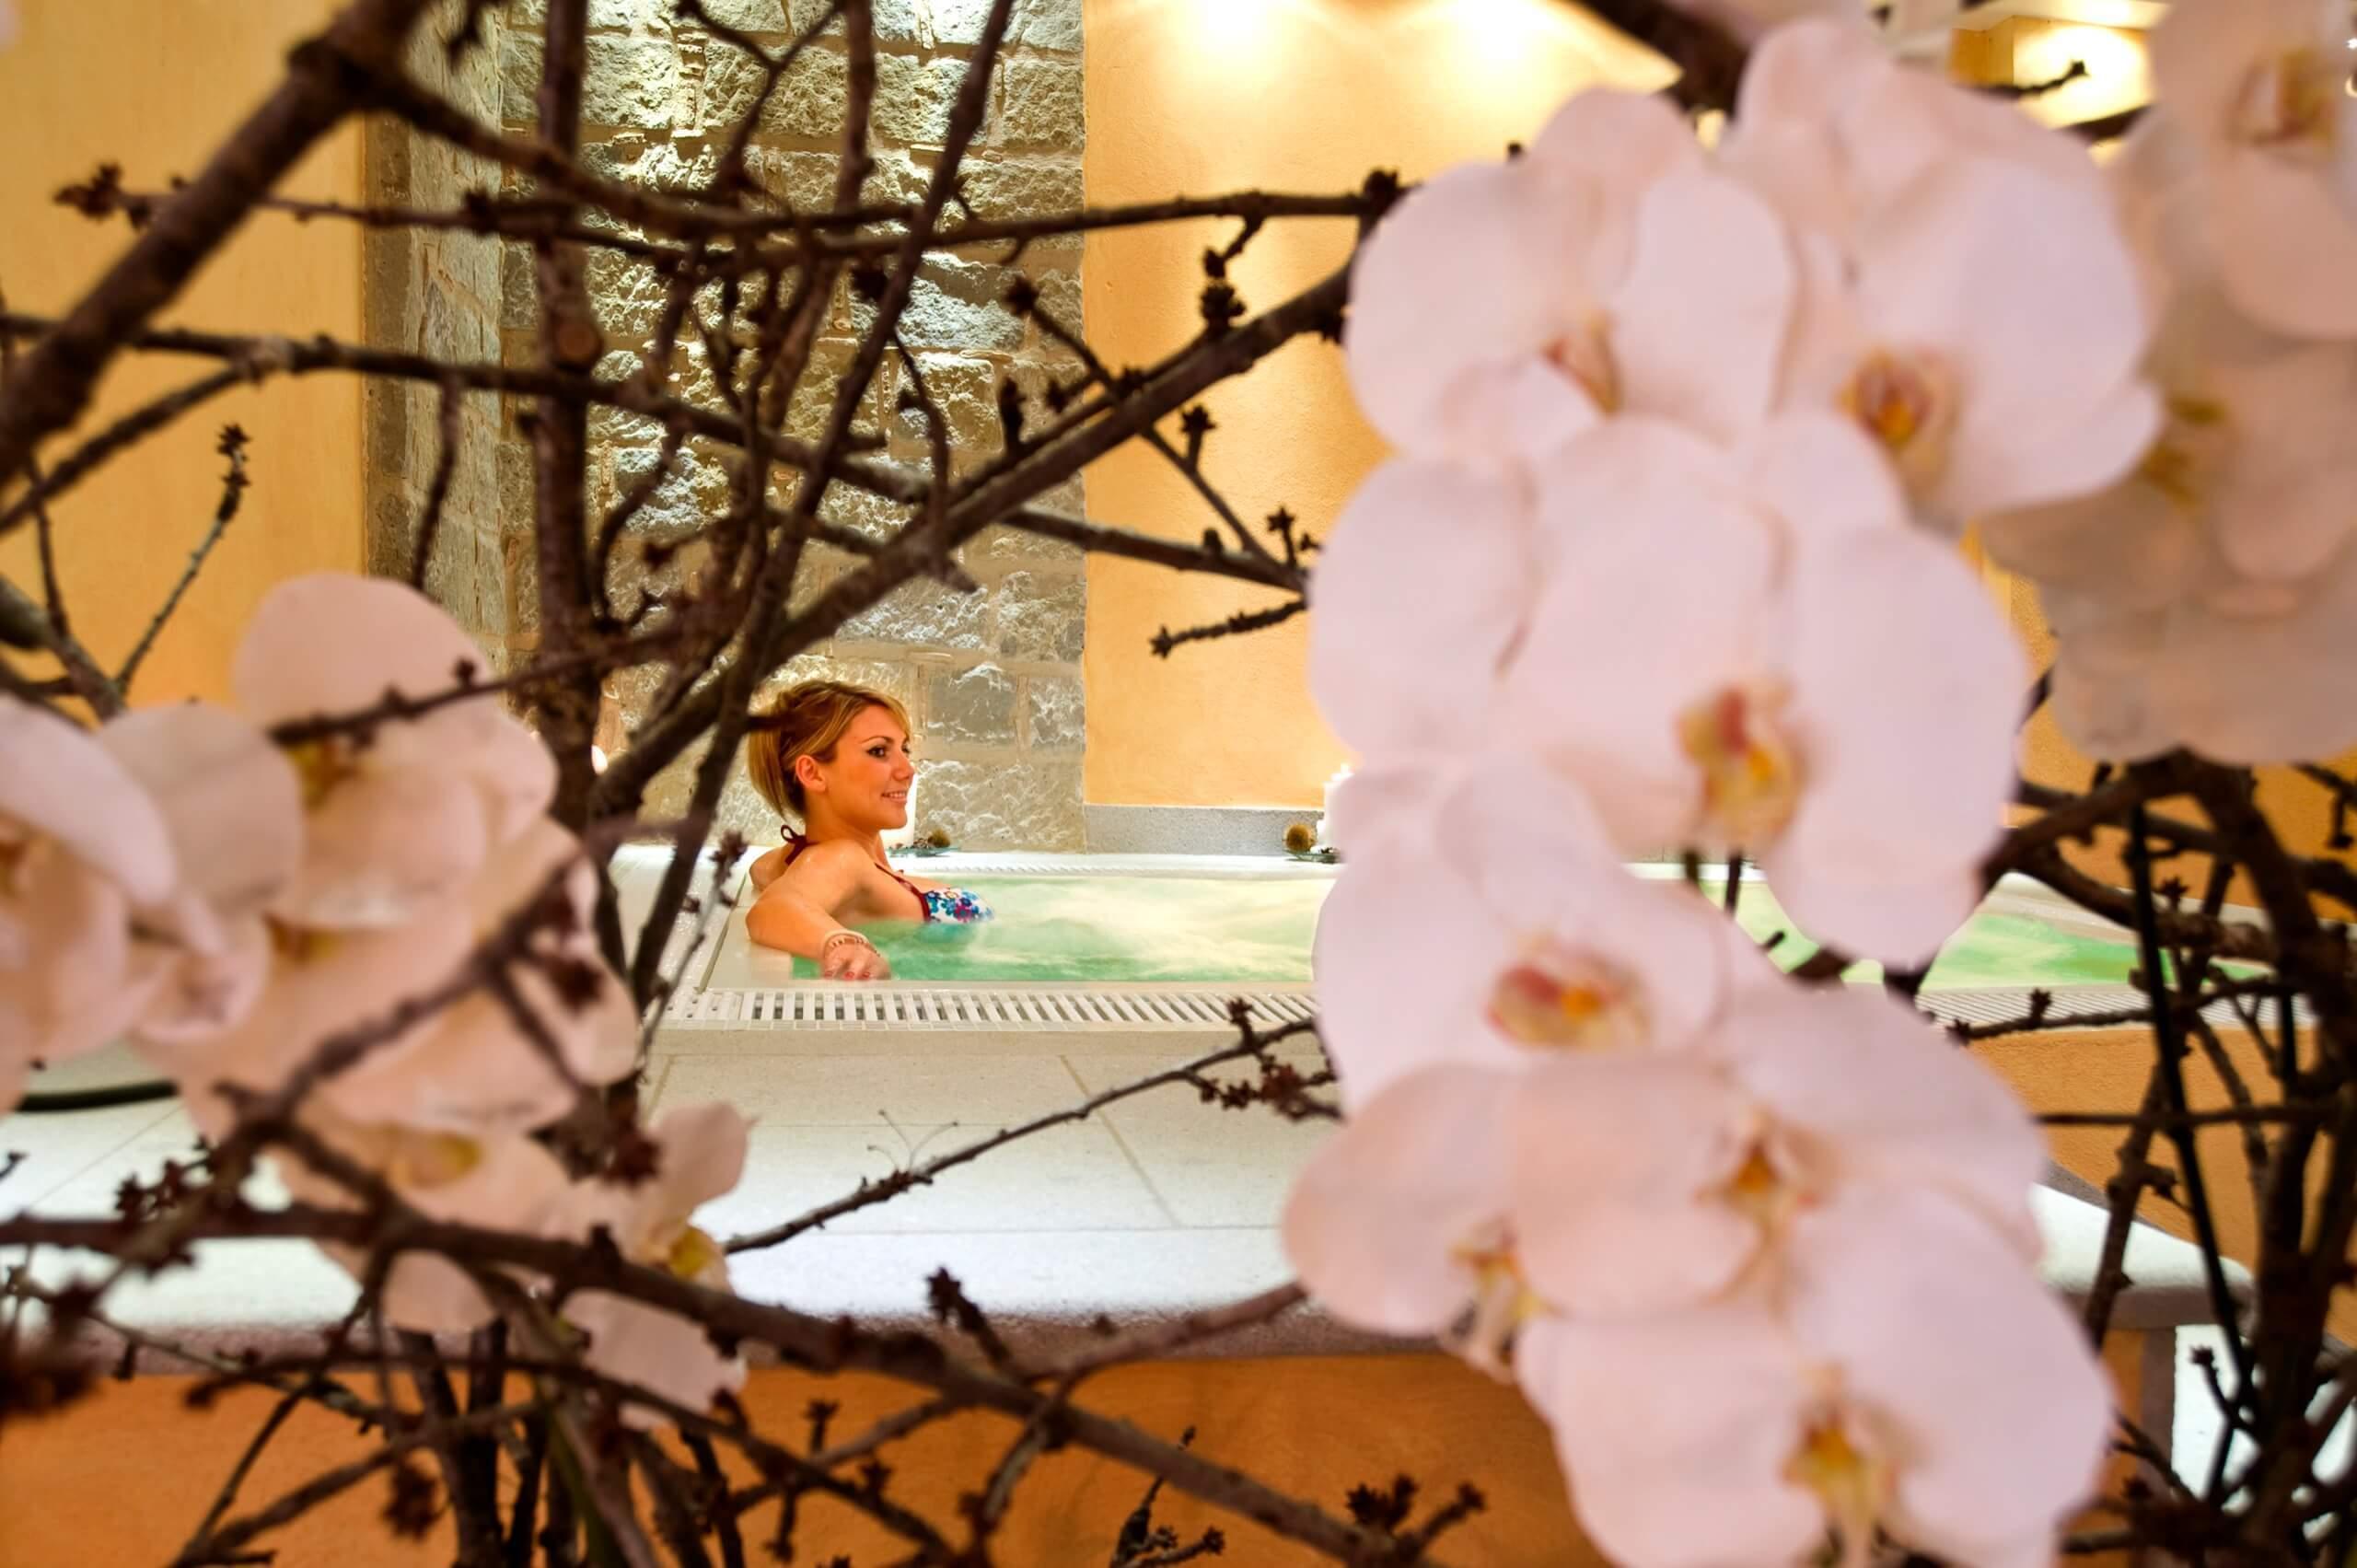 Montalbano Hotel Spa Vasca Idromassaggio 001